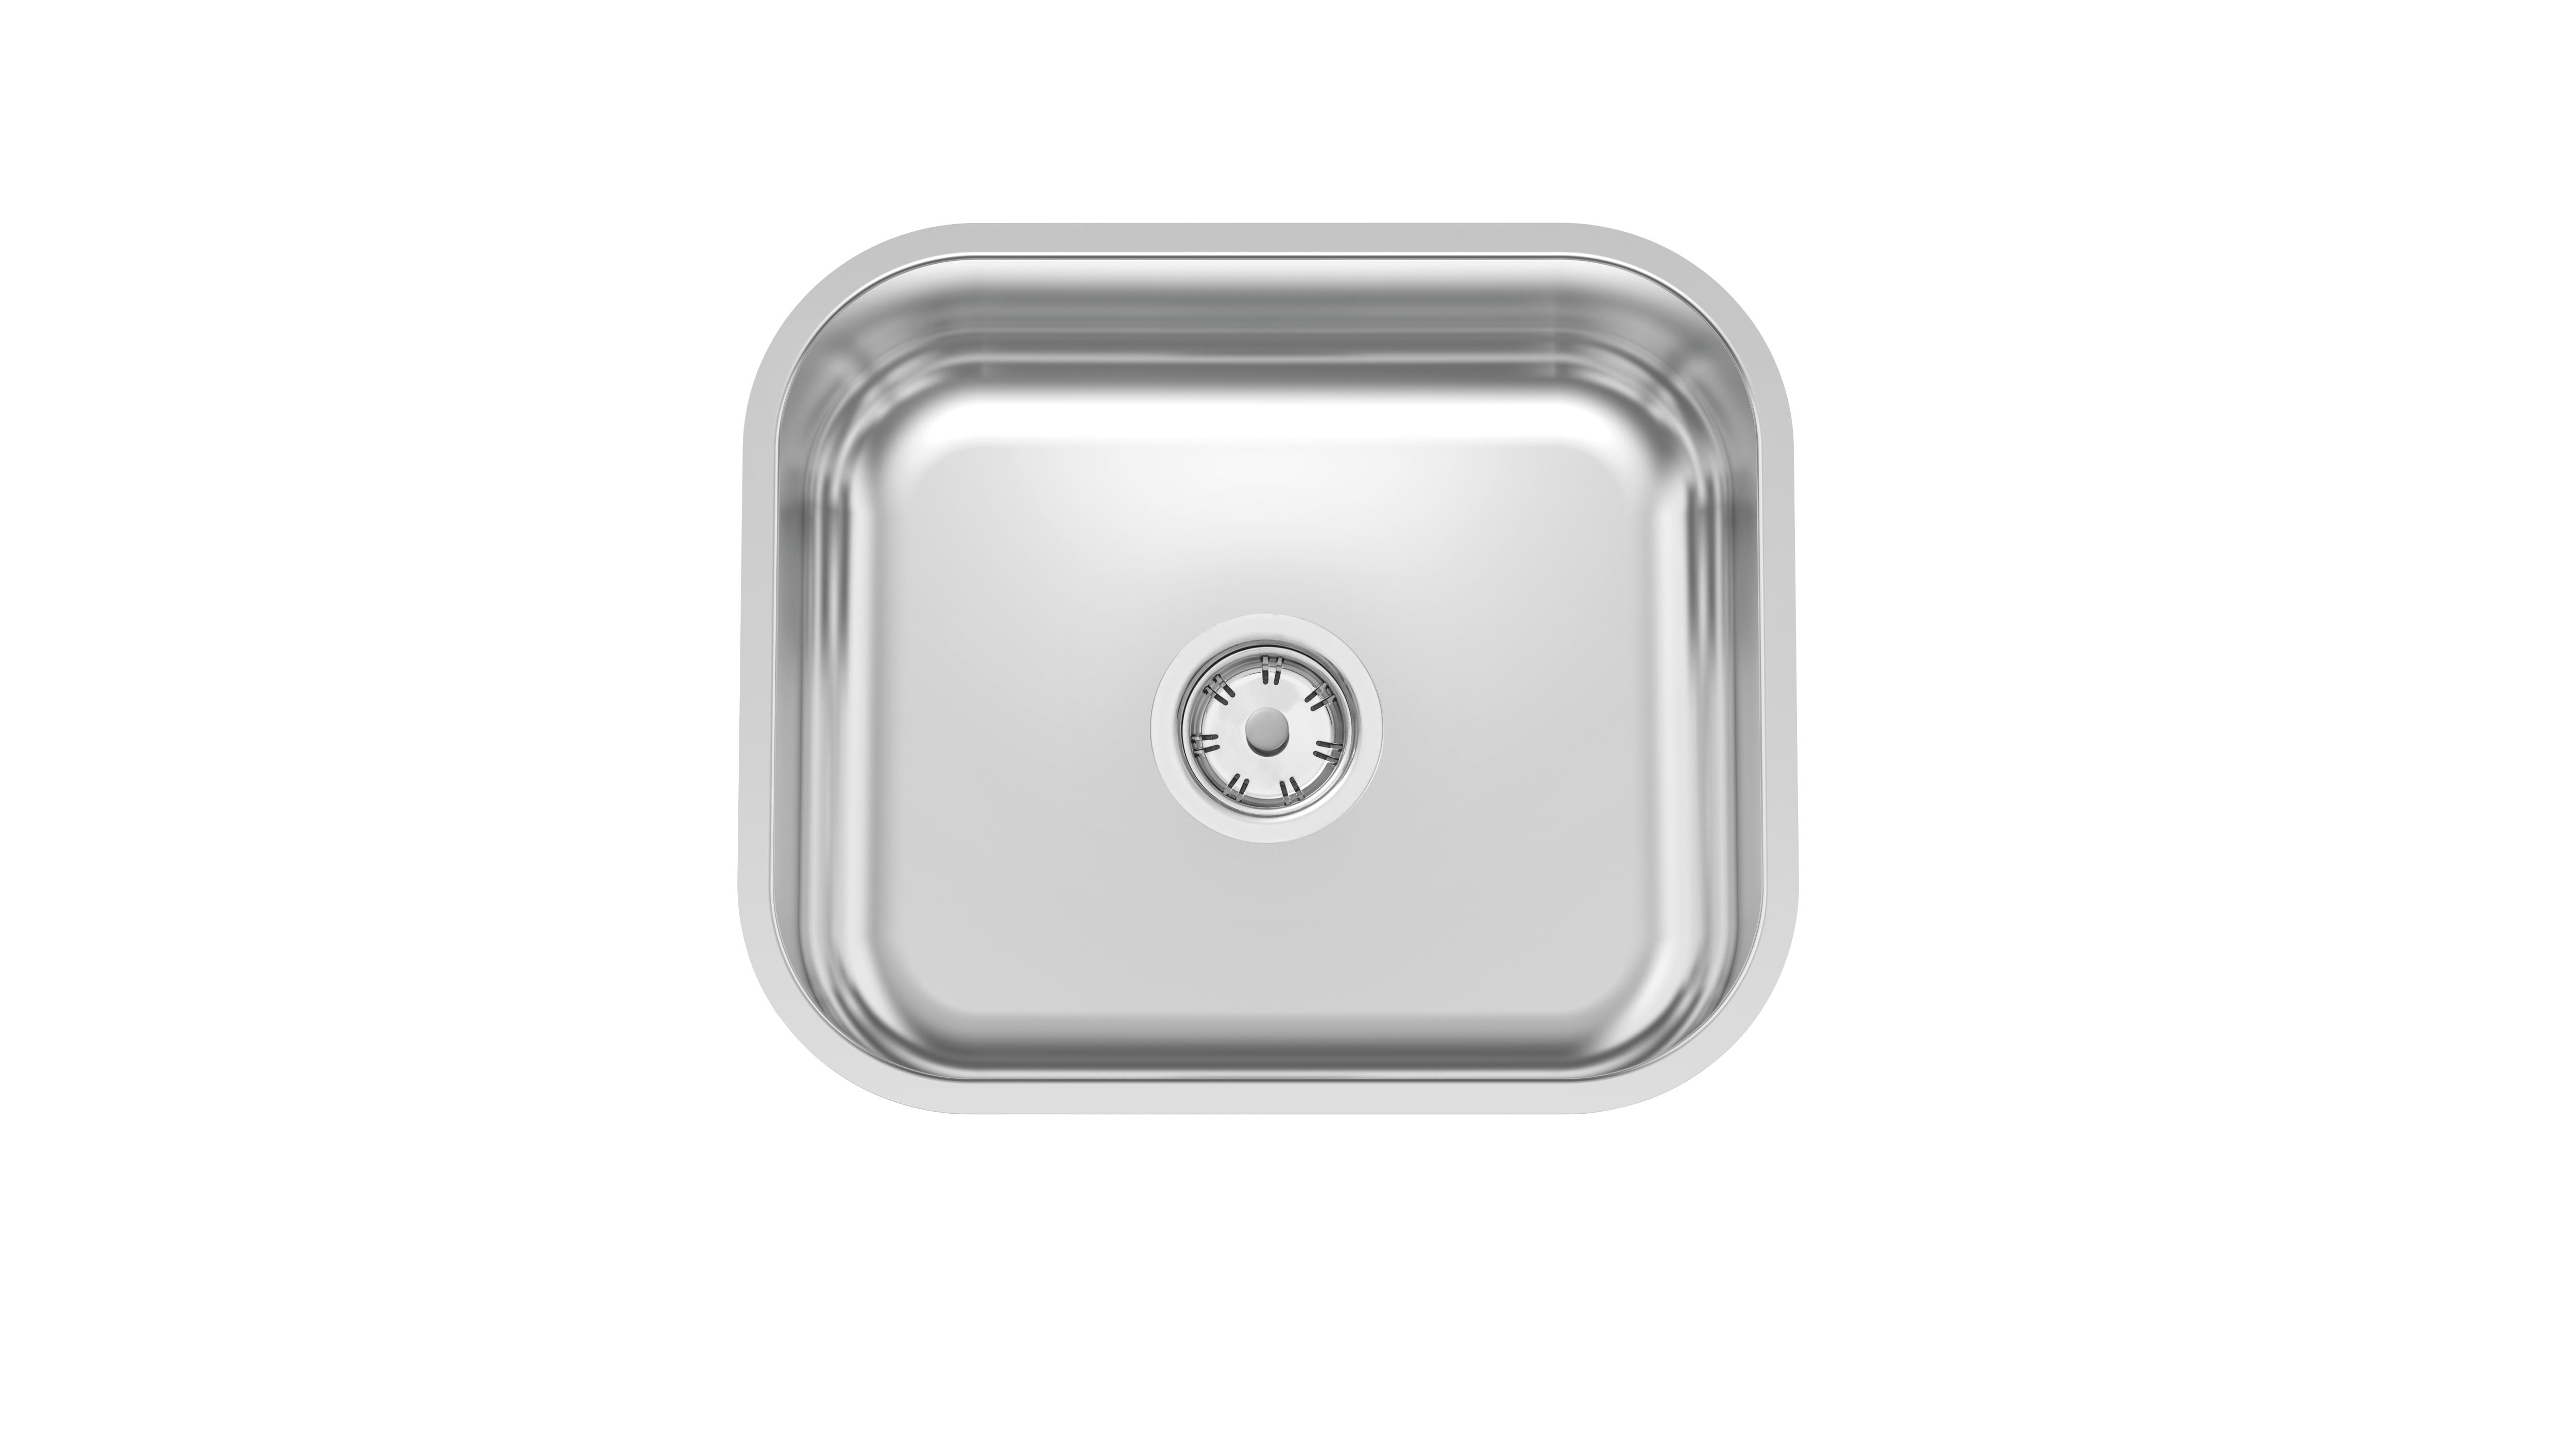 Cuba de embutir Lavínia 40 BL em Aço Inox Polido 40x34 cm 94081/507 - Tramontina